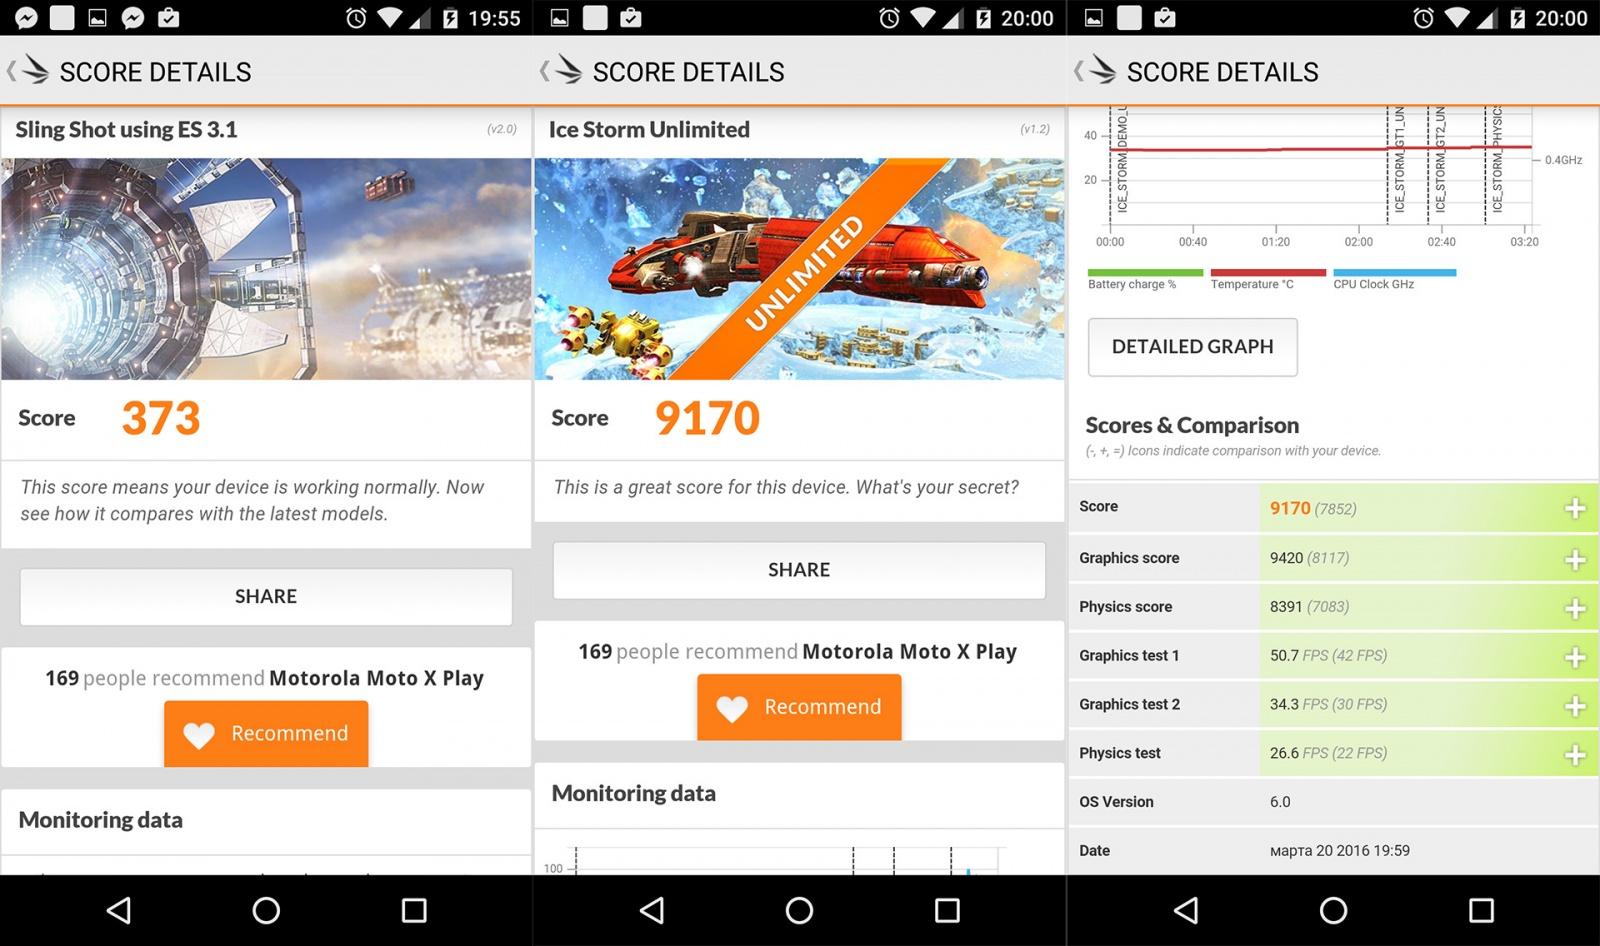 Moto X Play: яркий смартфон с ёмкой батареей - 7